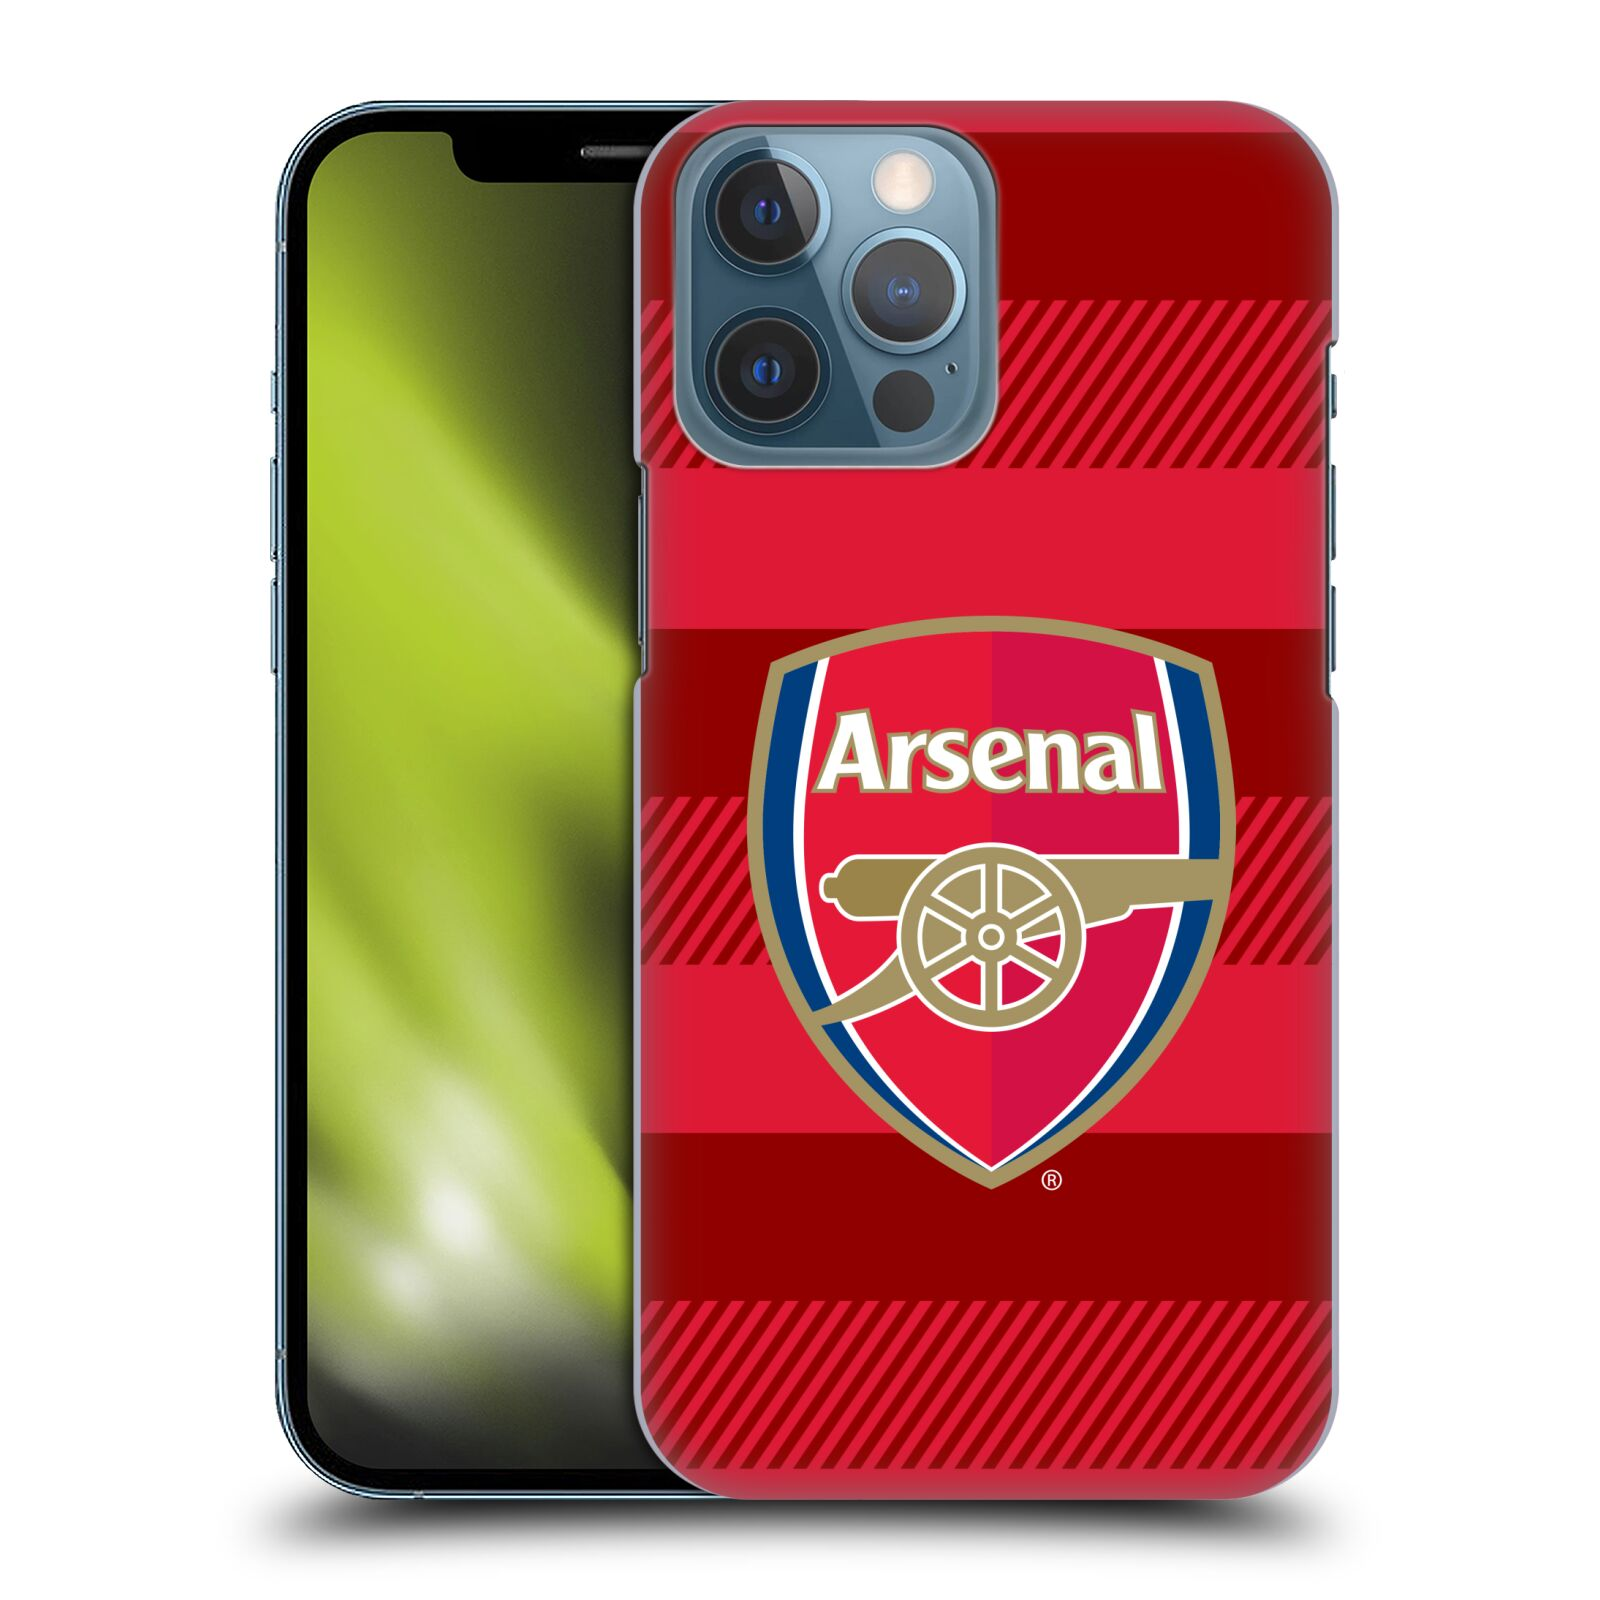 Plastové pouzdro na mobil Apple iPhone 13 Pro Max - Head Case - Arsenal FC - Logo s pruhy